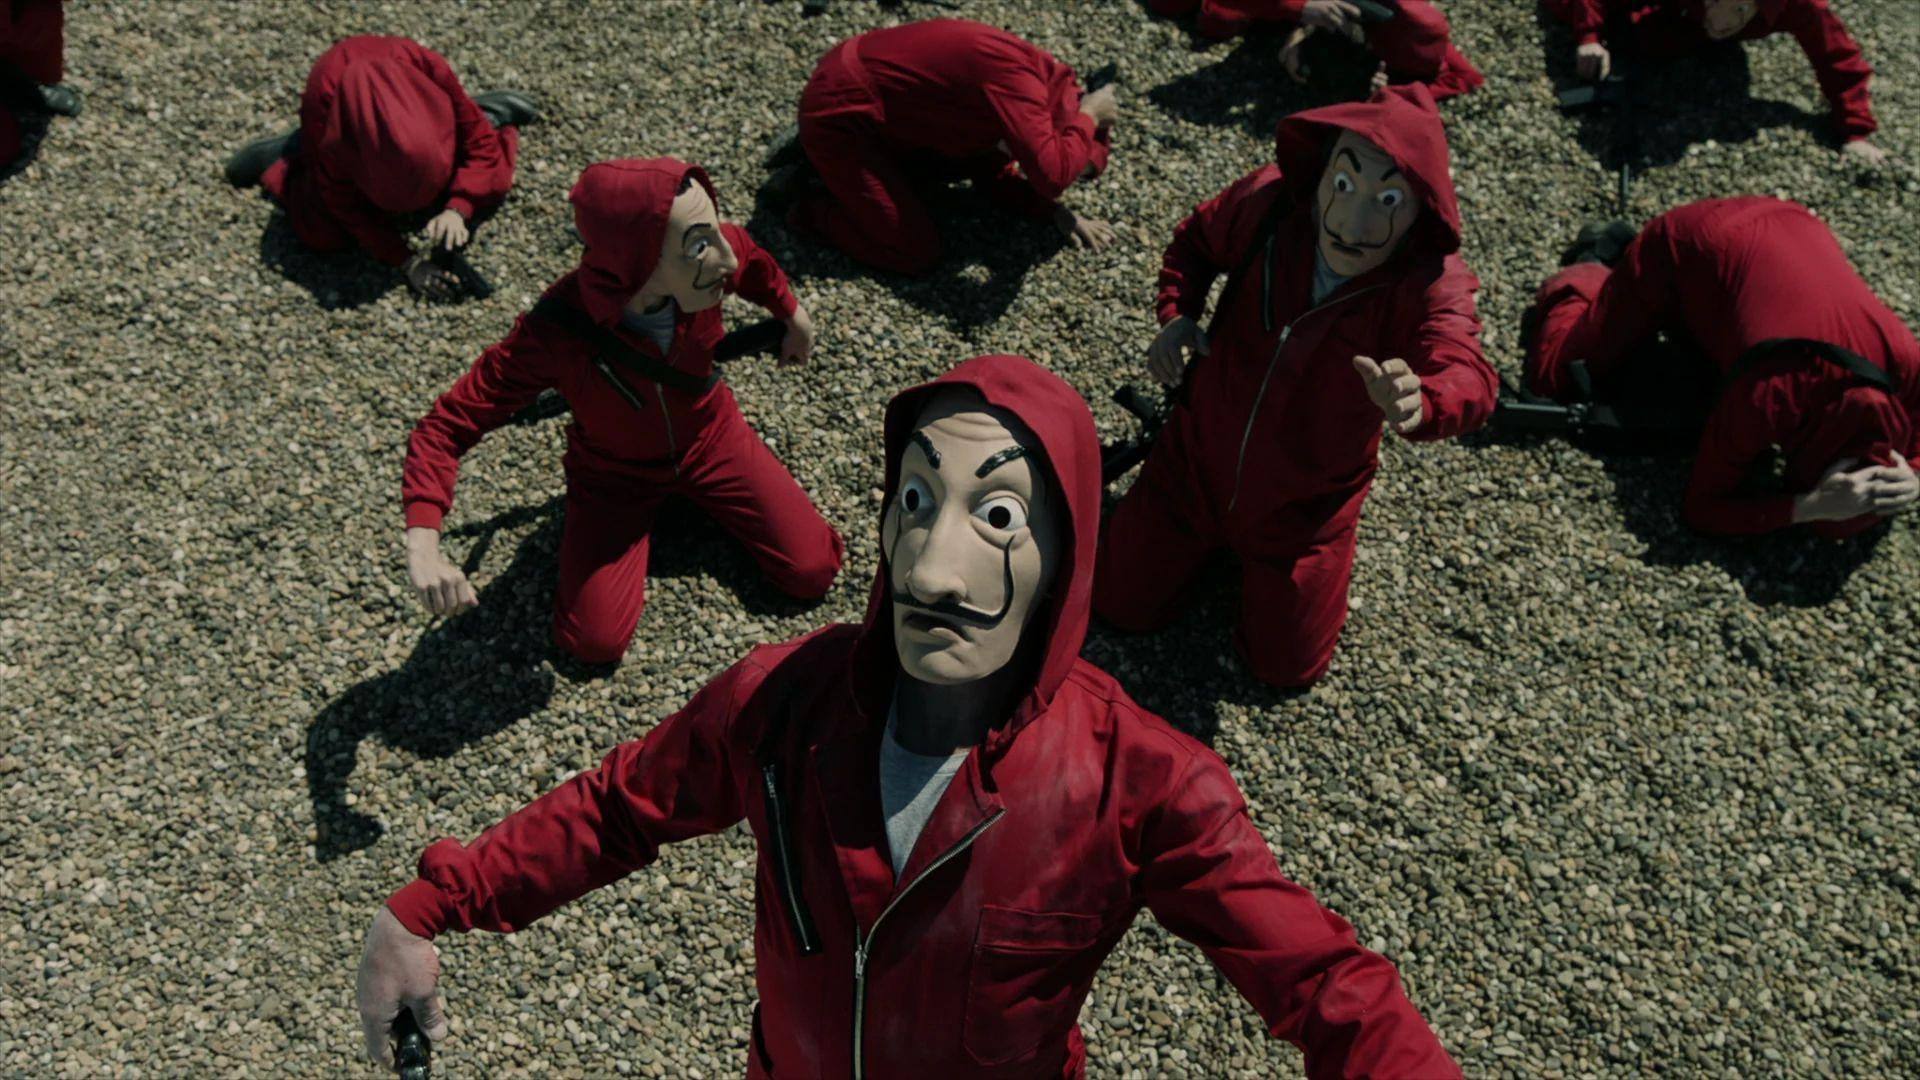 Image gallery for Money Heist (TV Series) - FilmAffinity